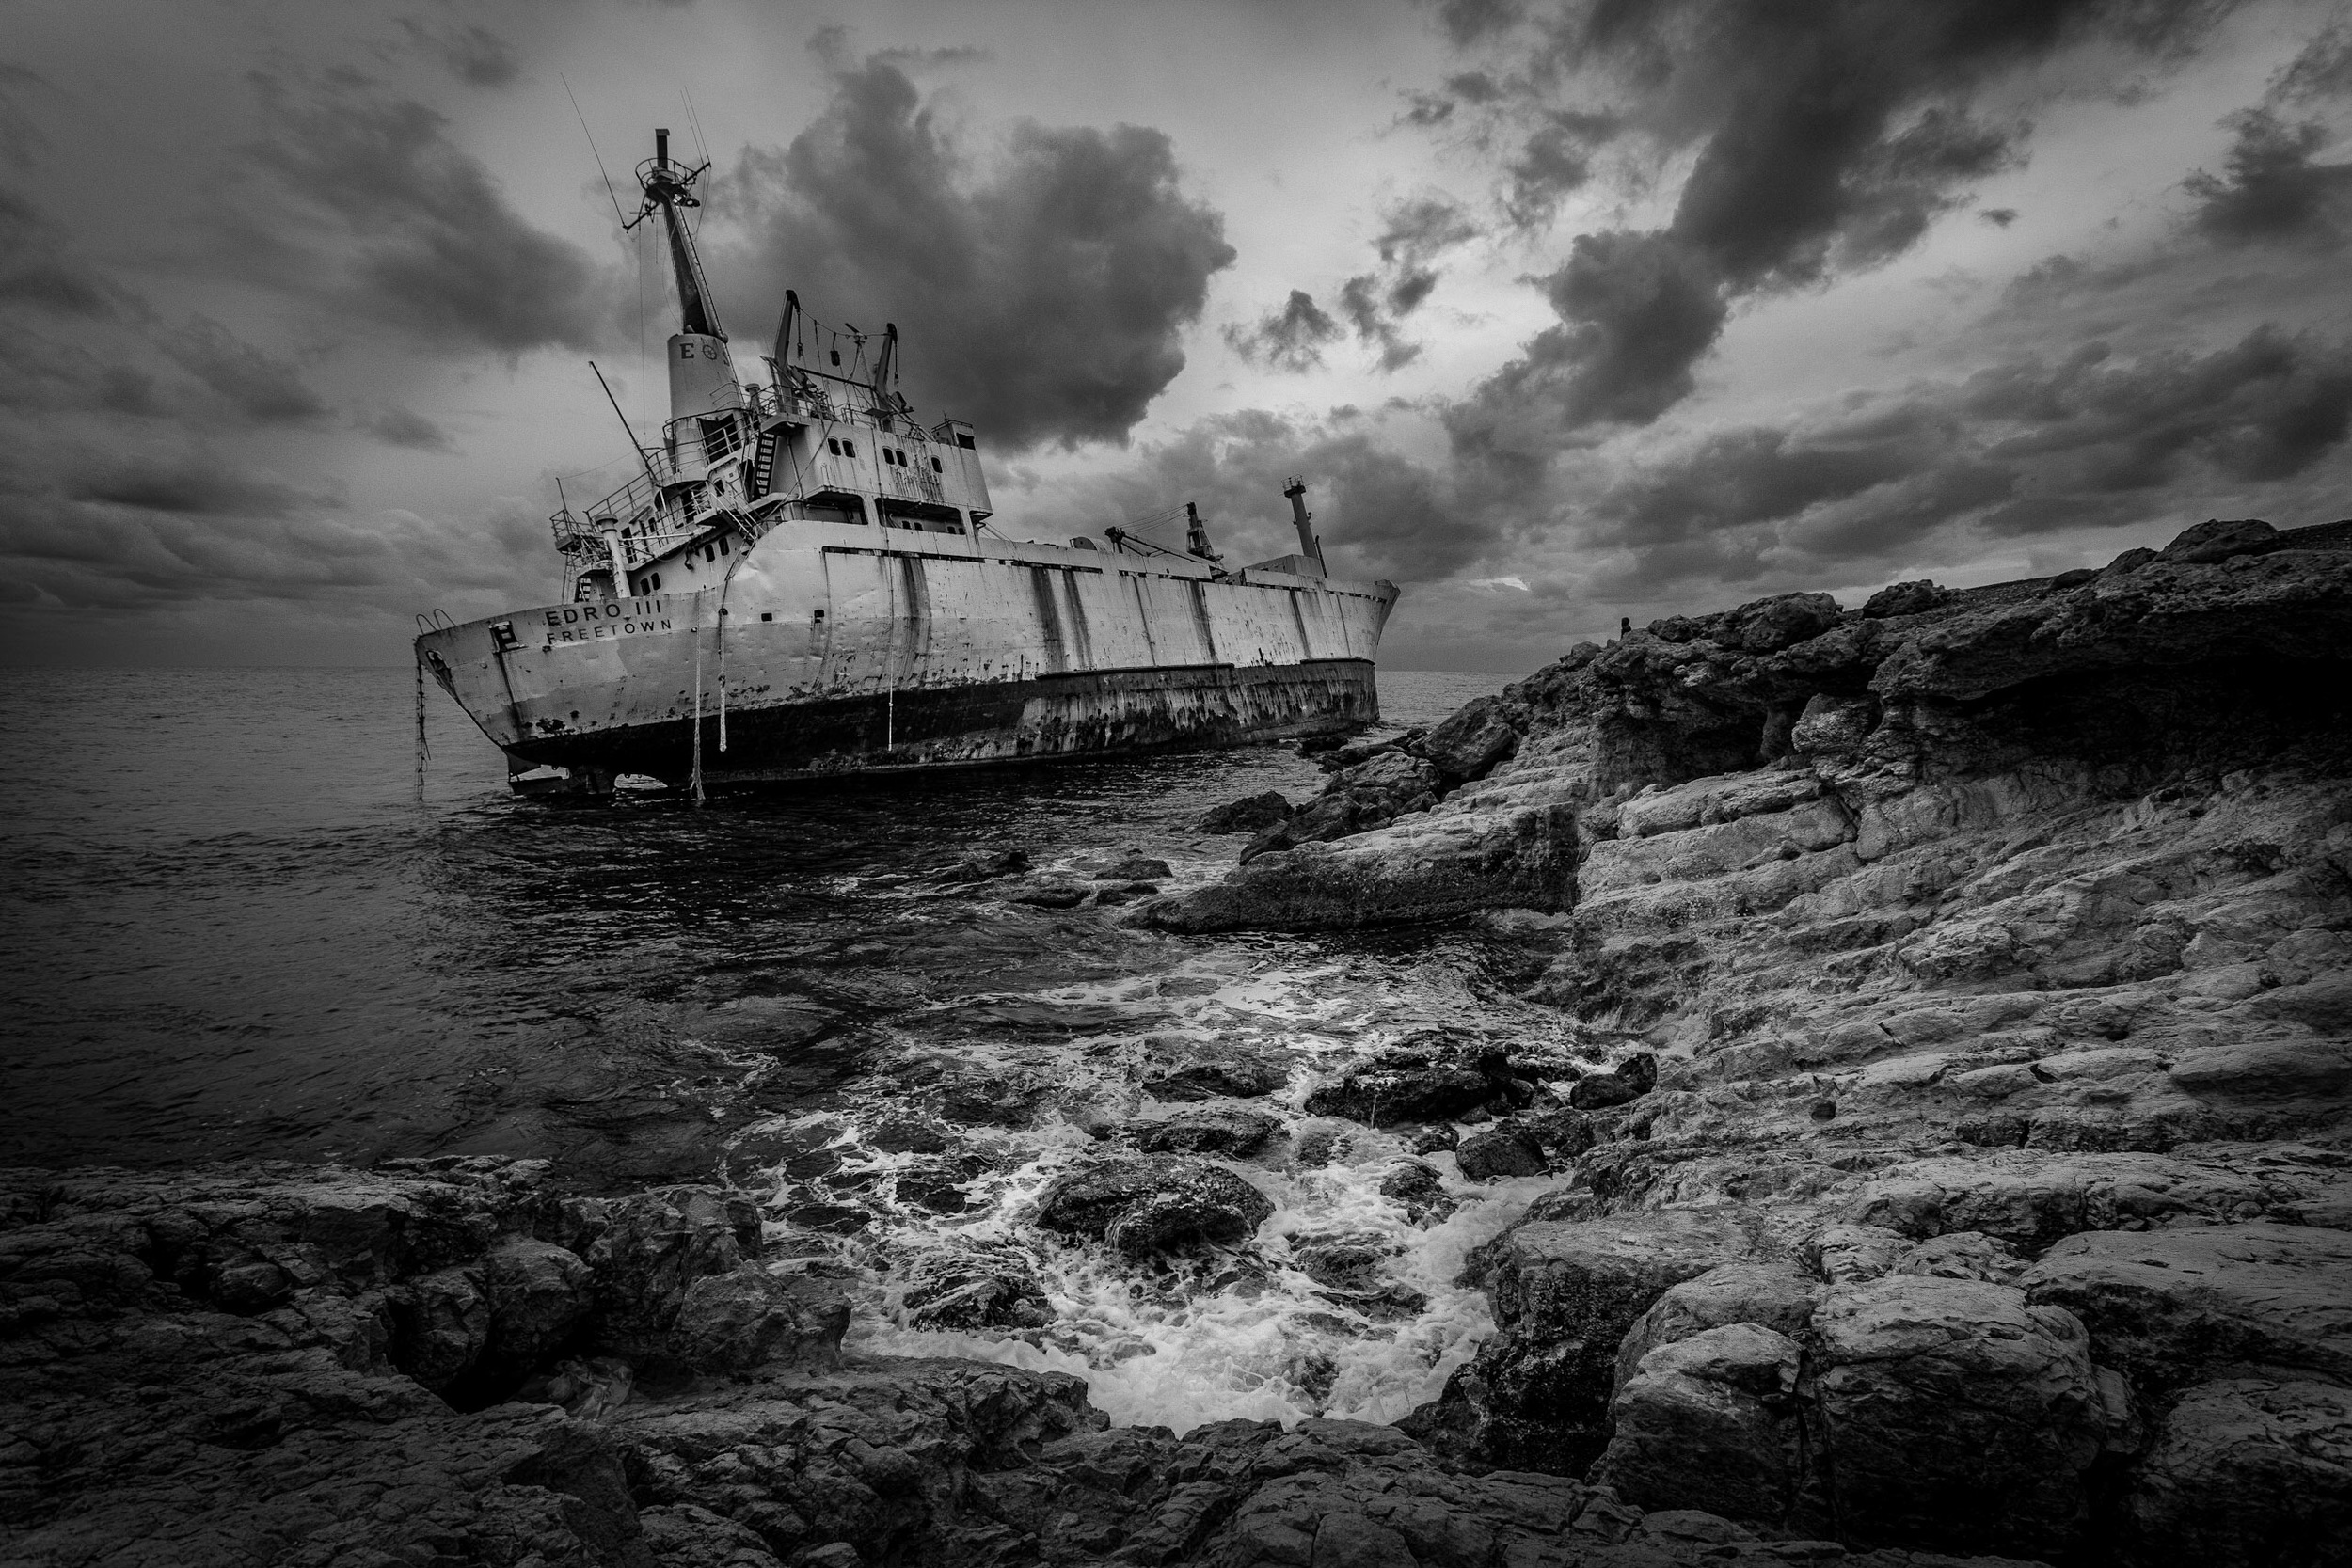 Shipwreck, Cyprus - black and white conversion using Nik Sikver Efex Pro